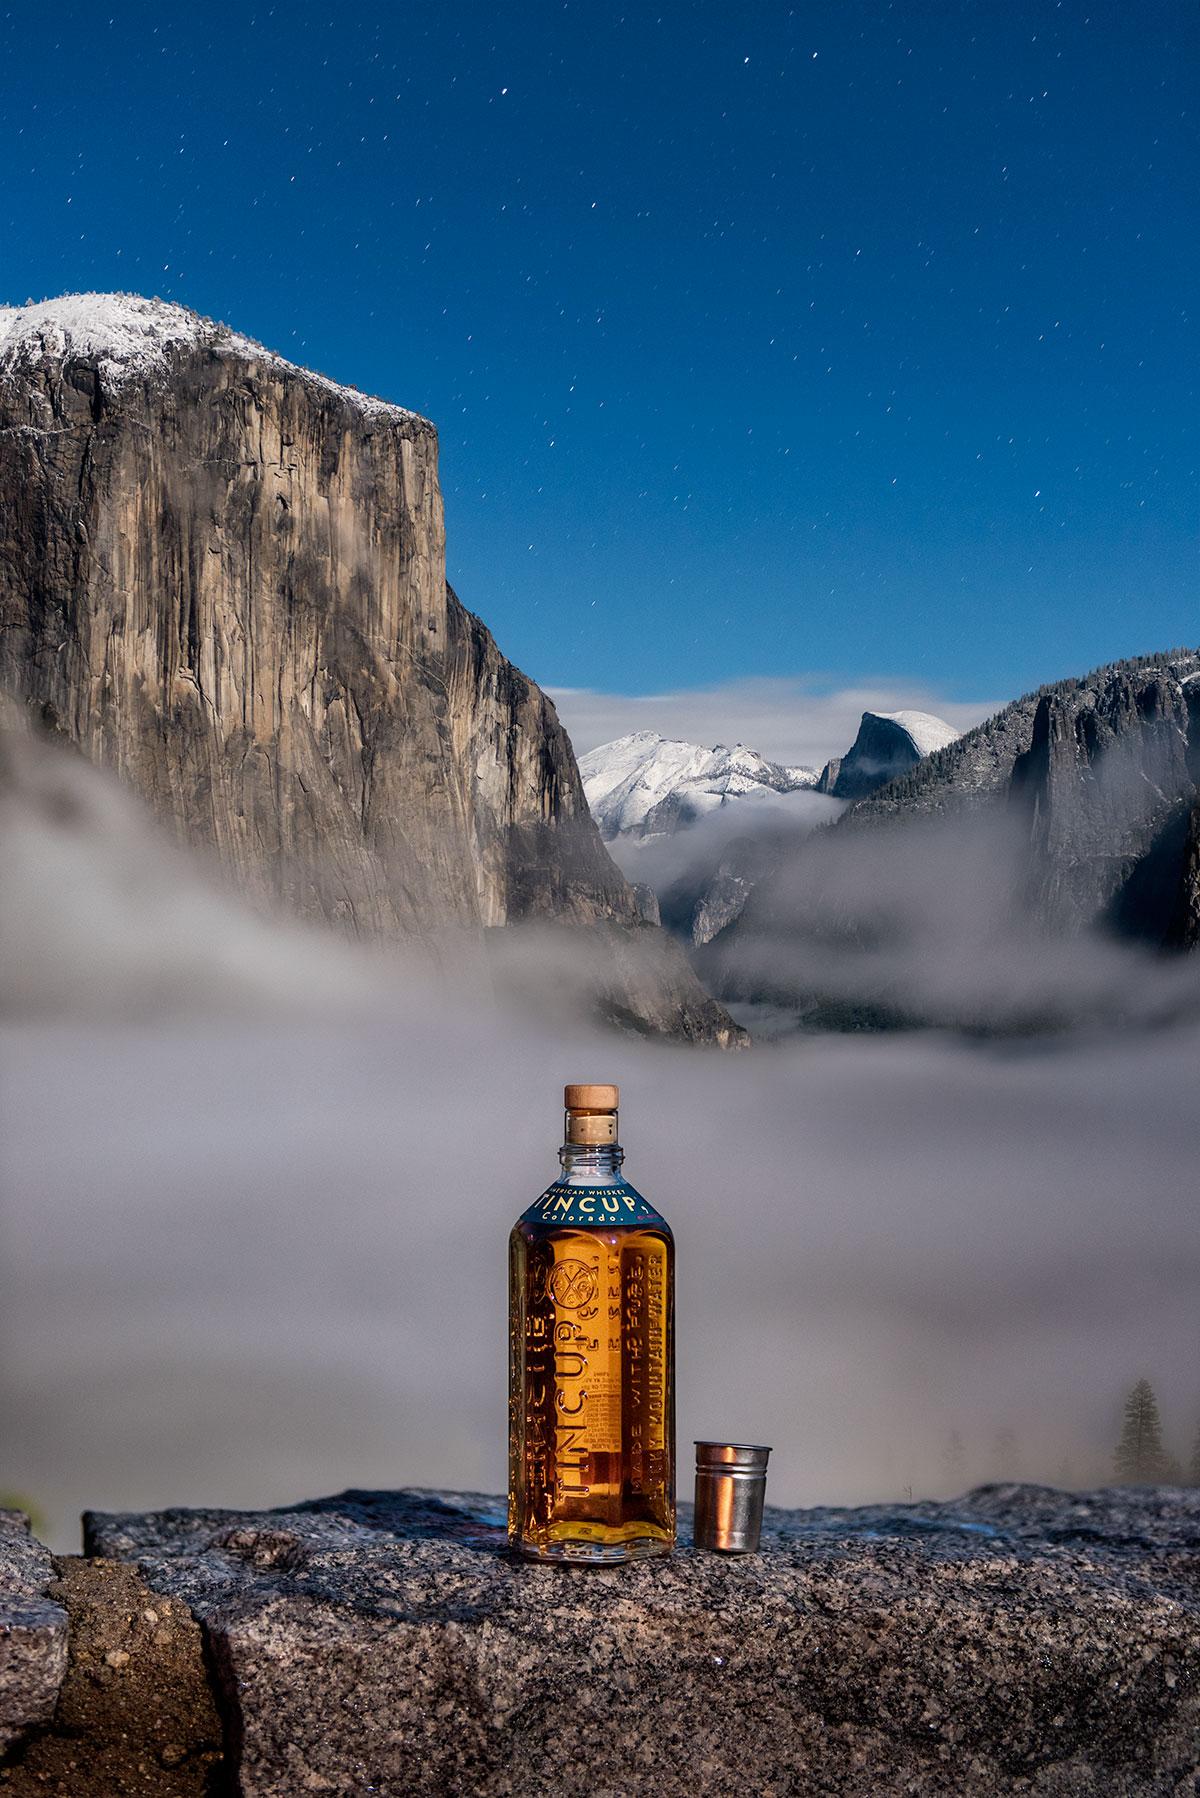 austin-trigg-whiskey-yosemite-product-TINCUP-Tunnel-View-bottle-fog-el-capitan-half-dome.jpg